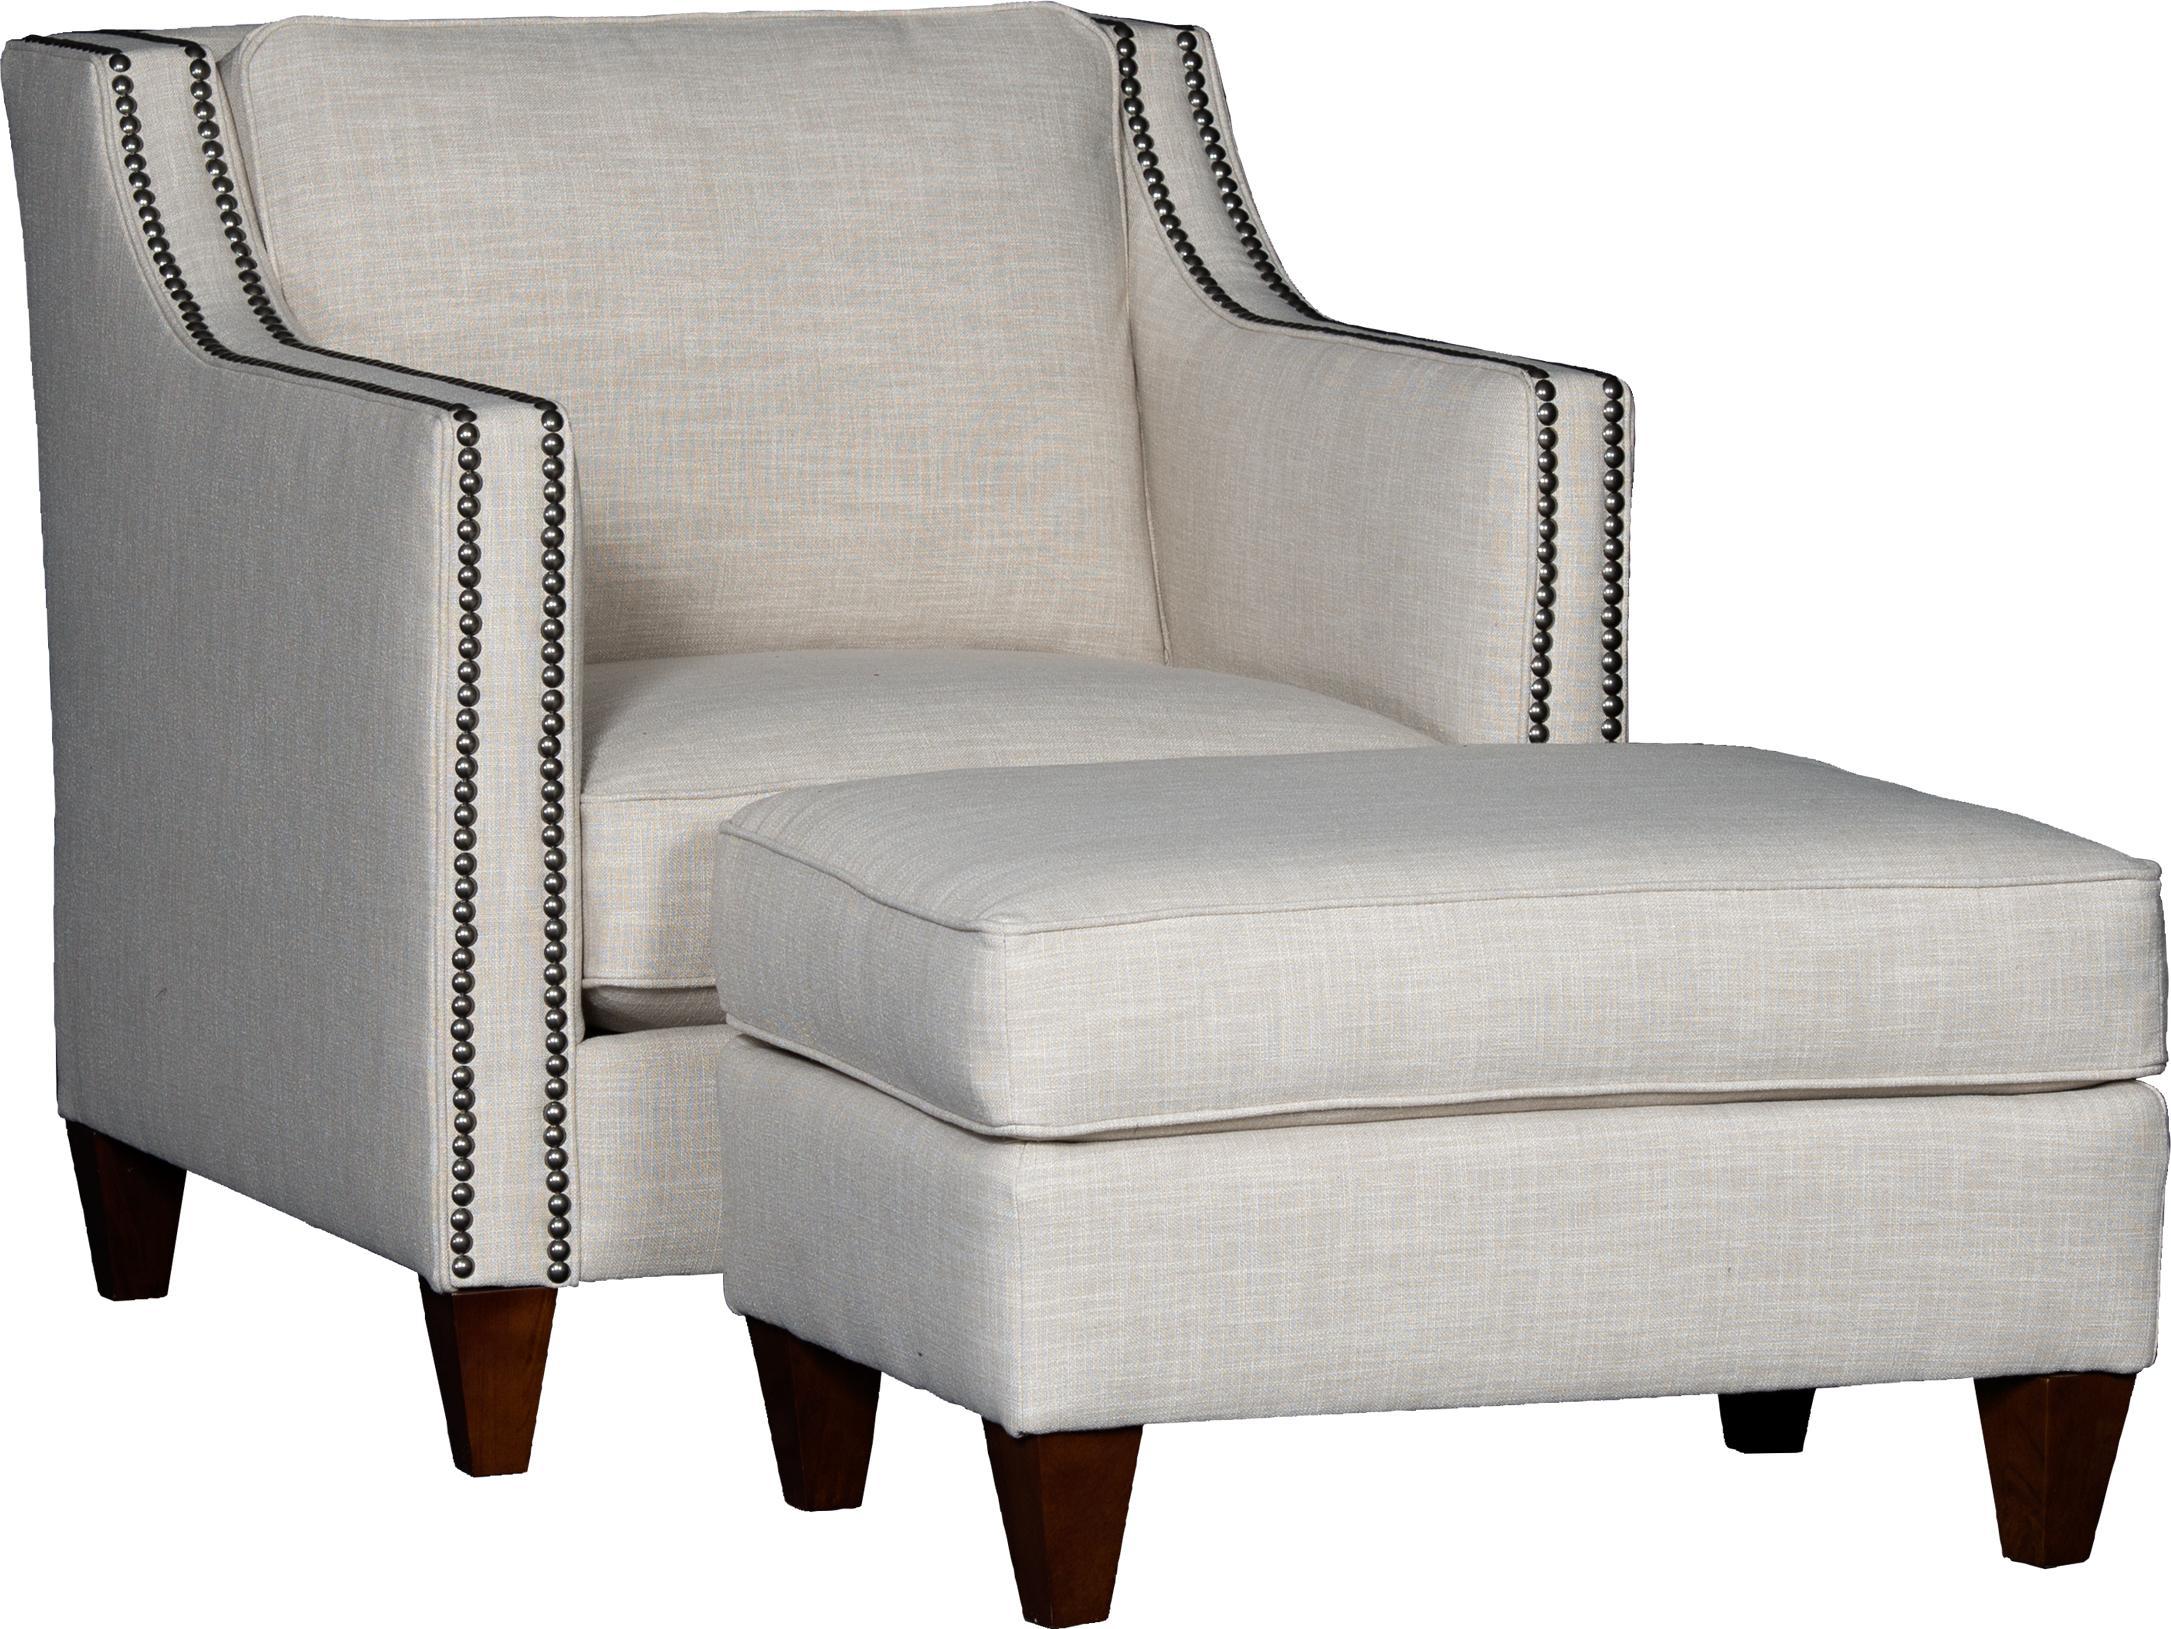 6170 Chair & Ottoman Set by Mayo at Pedigo Furniture